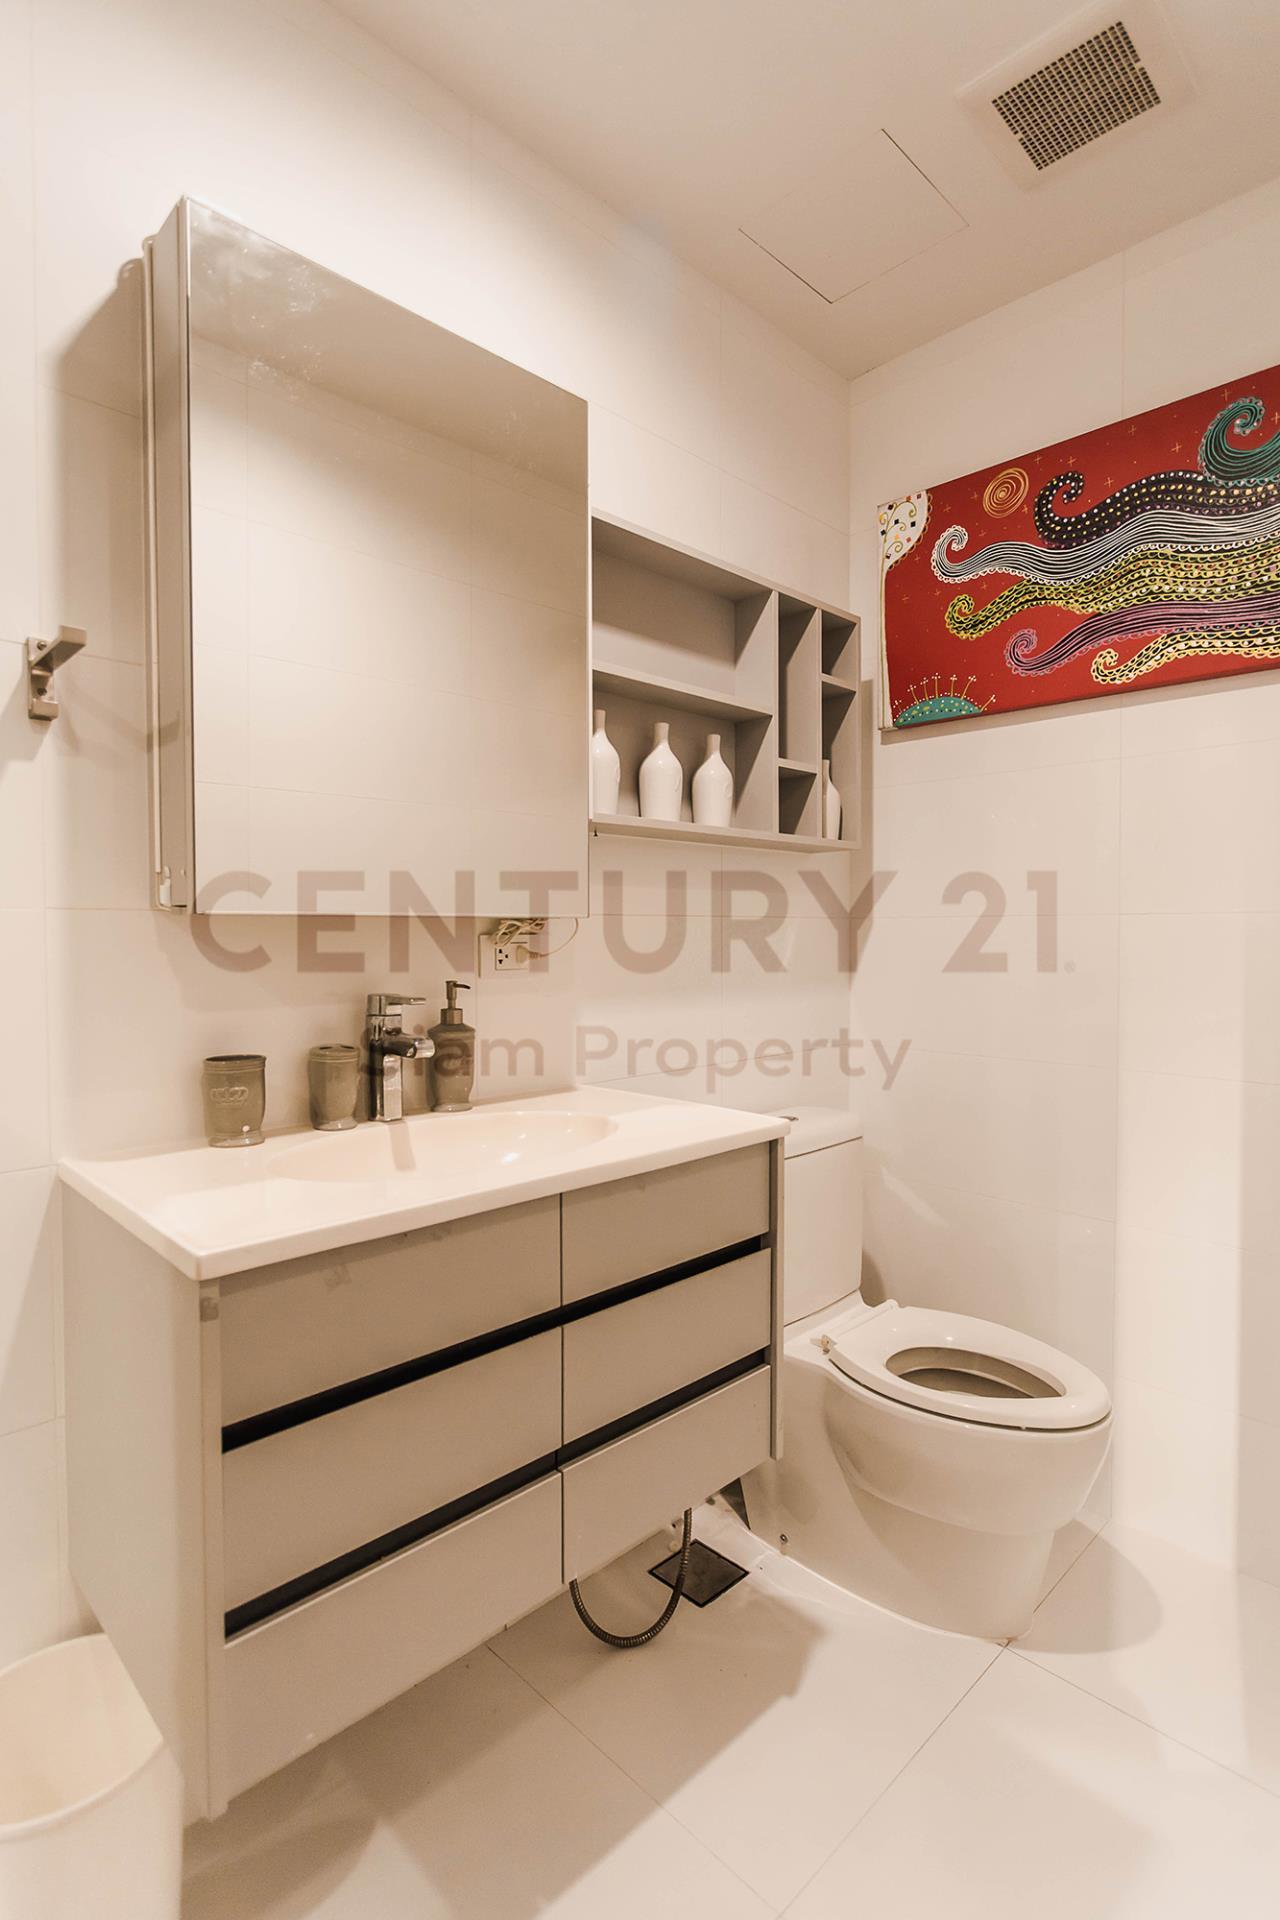 Century21 Siam Property Agency's HQ 7